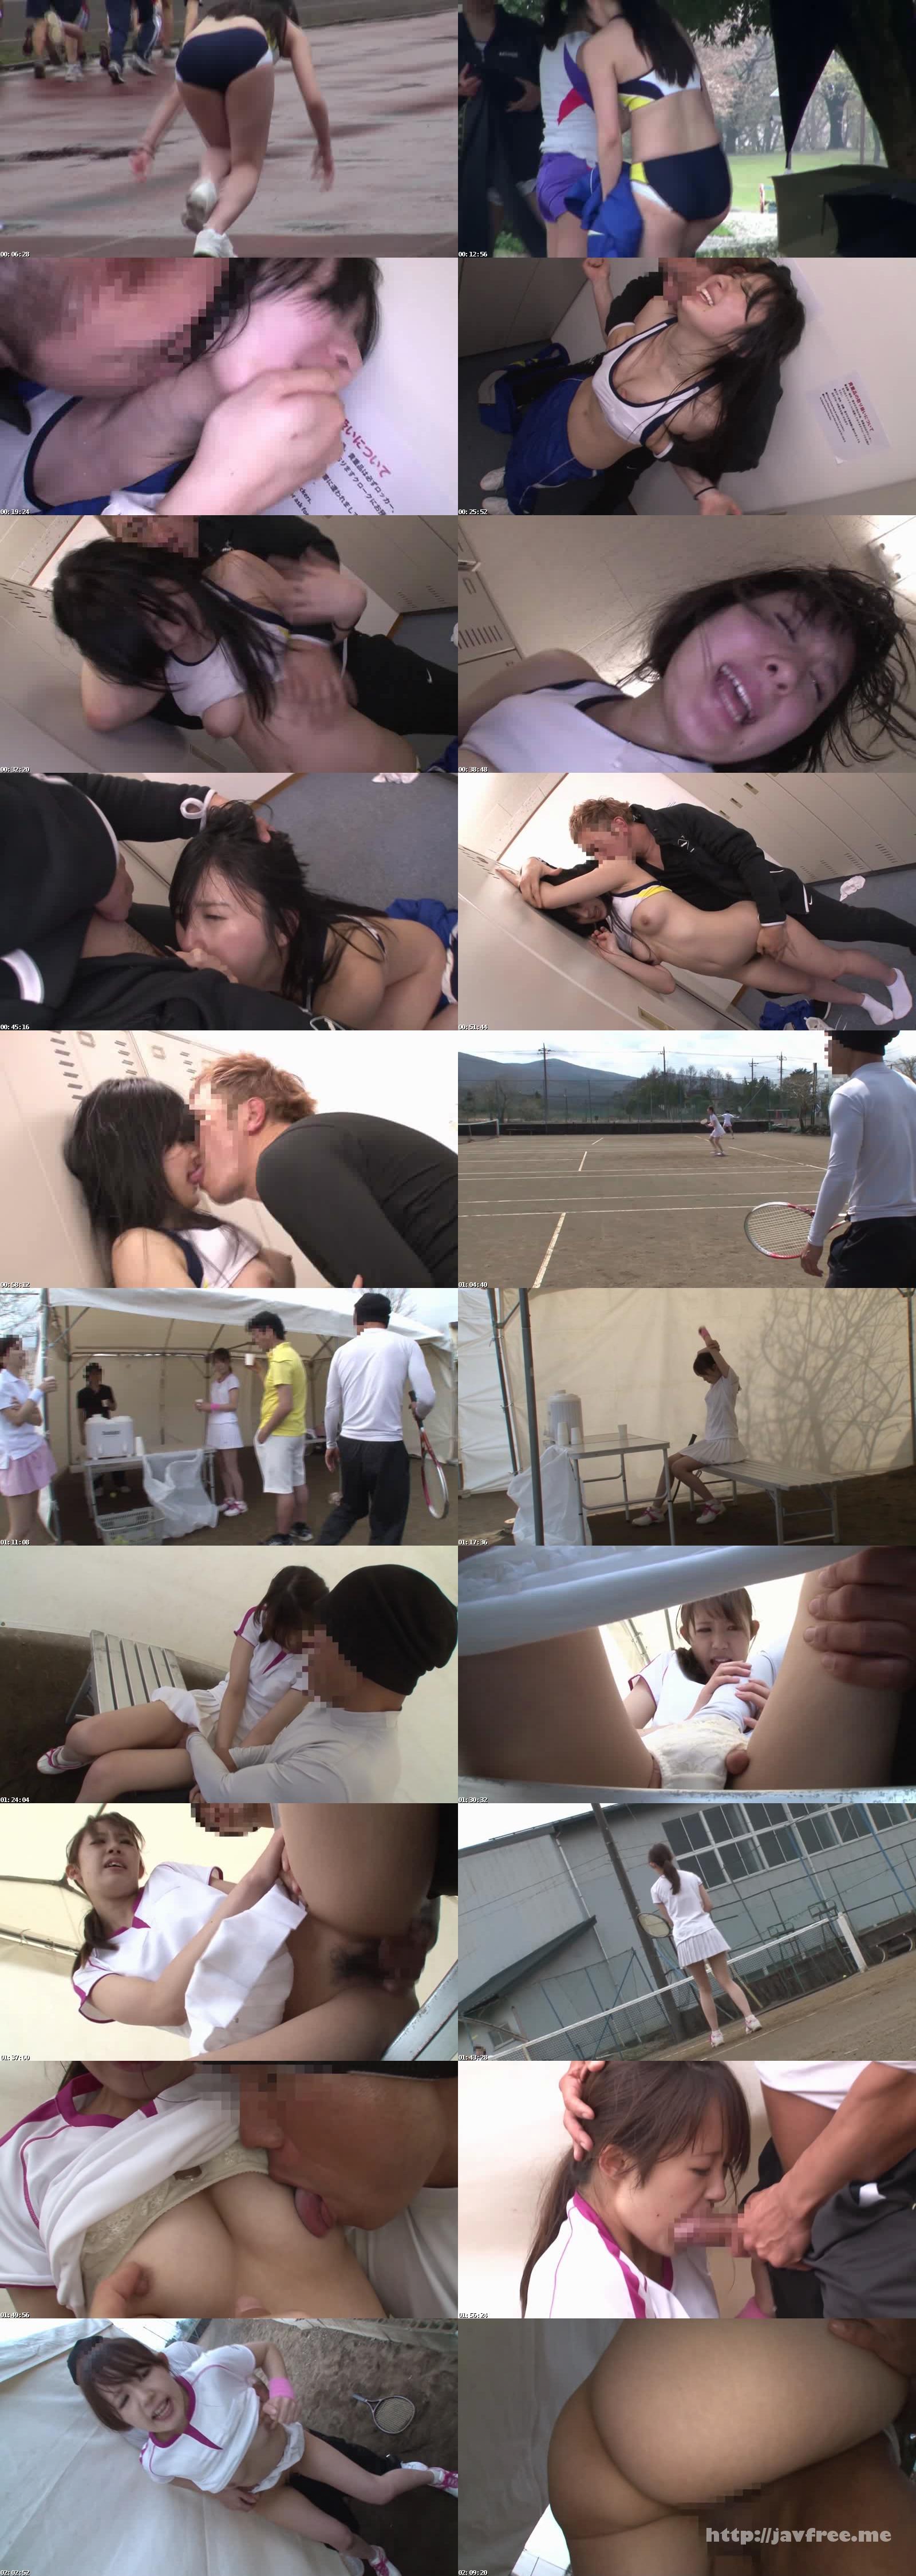 [NHDTA-688] 女子スポーツ選手痴漢〜陸上、テニス、剣道〜 - image NHDTA-688a on https://javfree.me